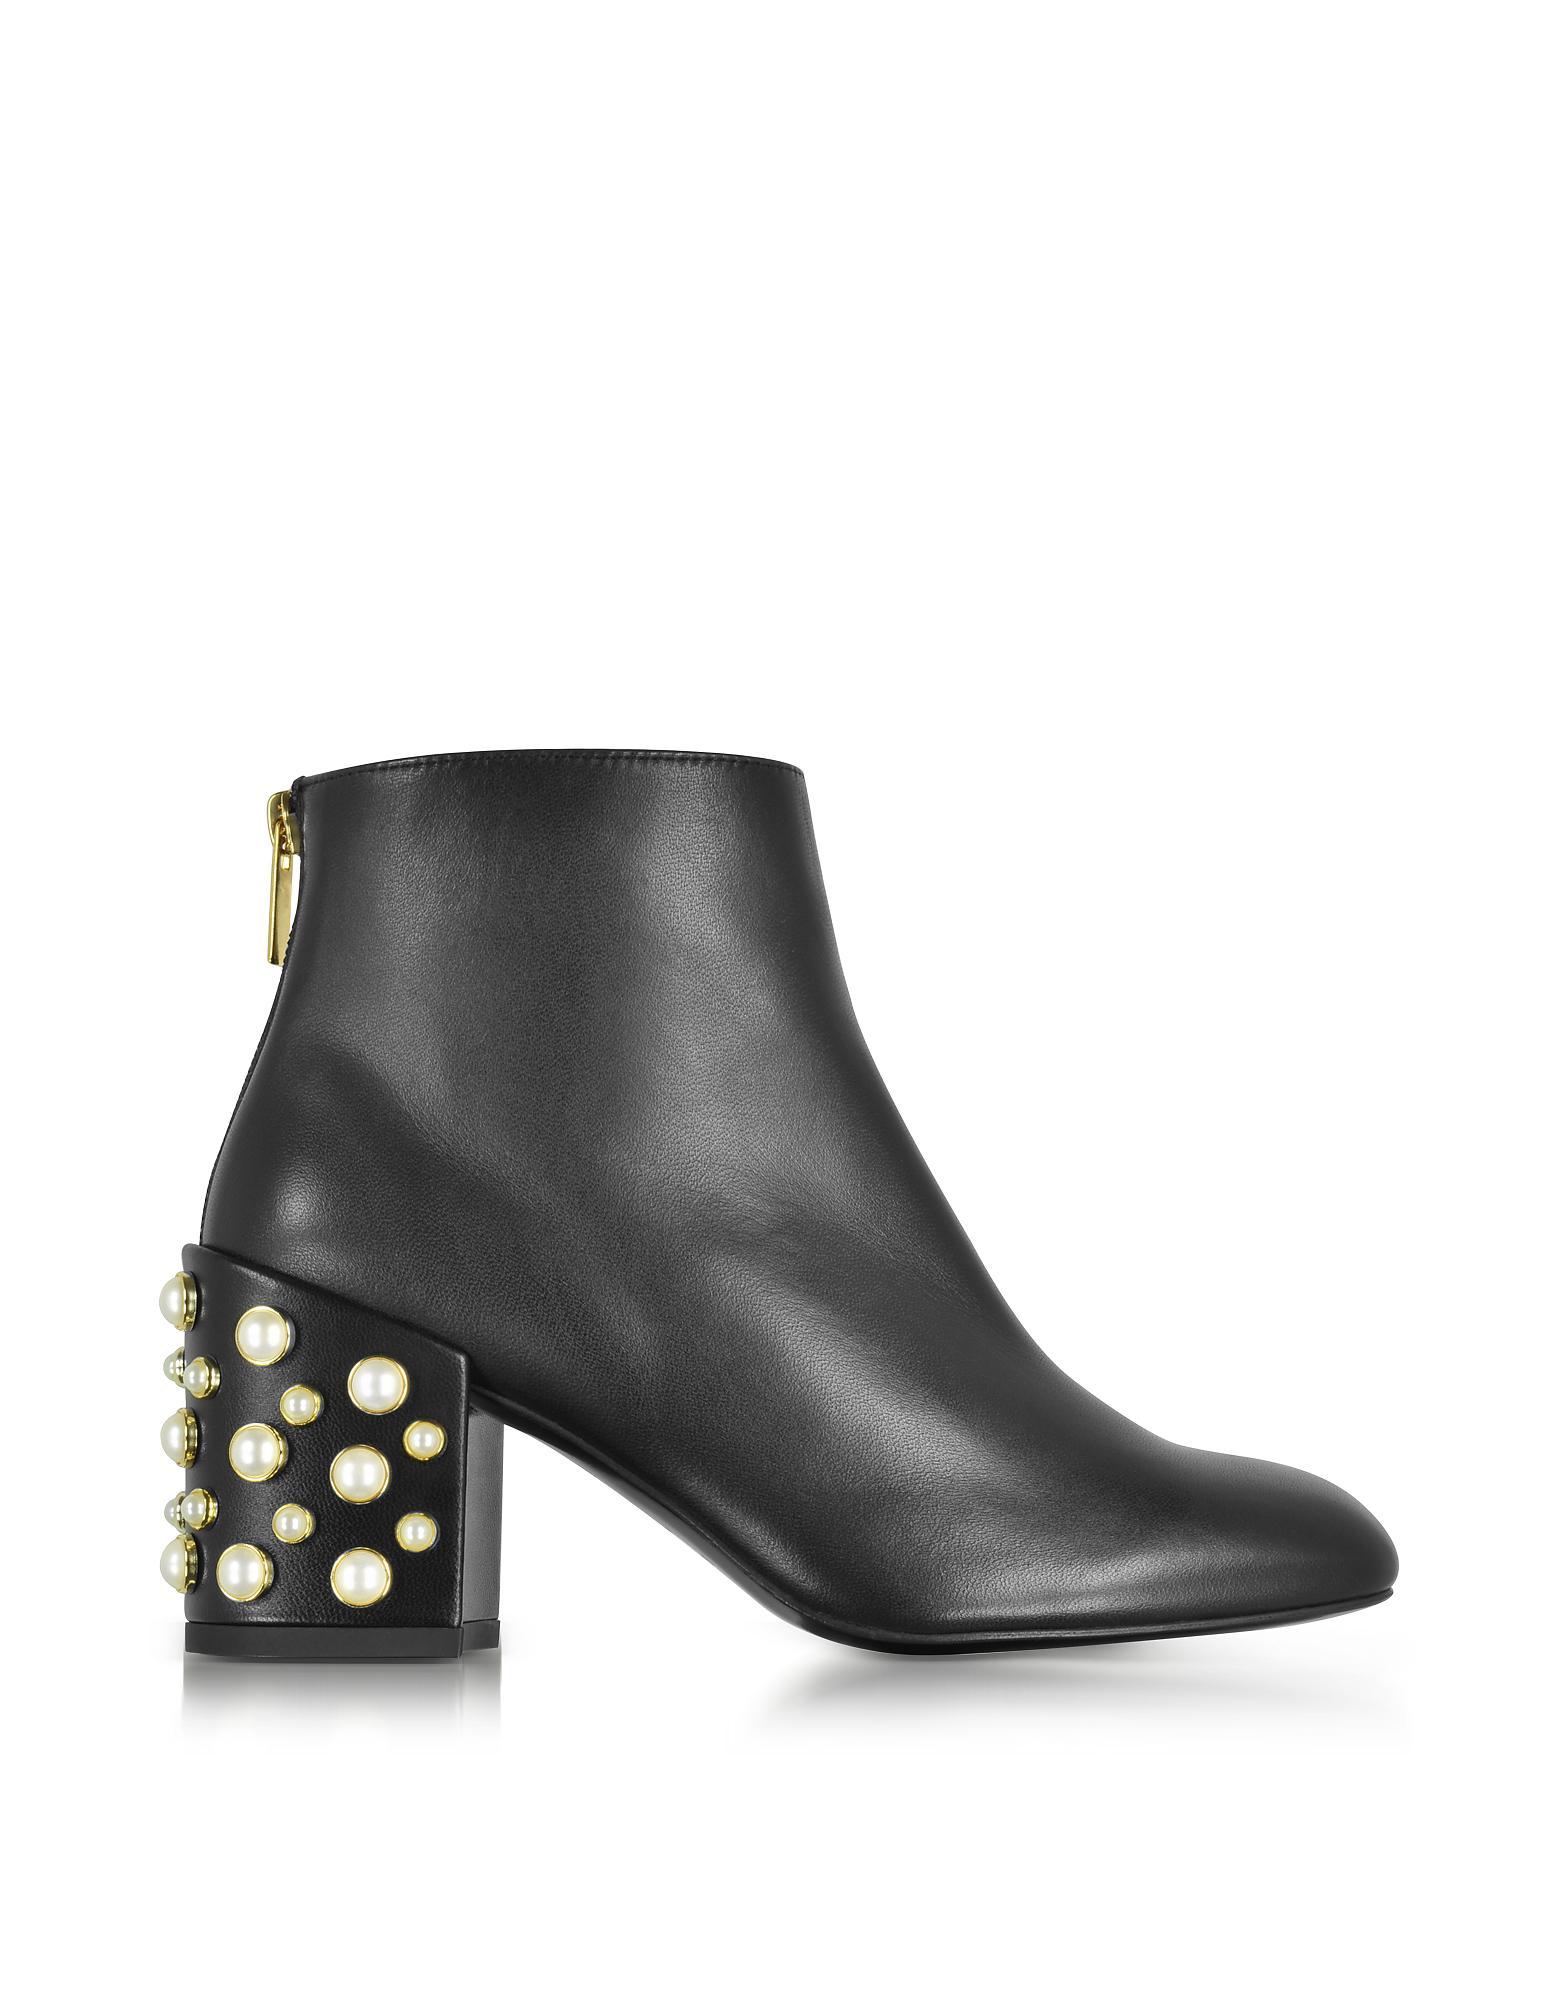 Stuart Weitzman Pearlbacari Black Nappa Leather Heel Ankle